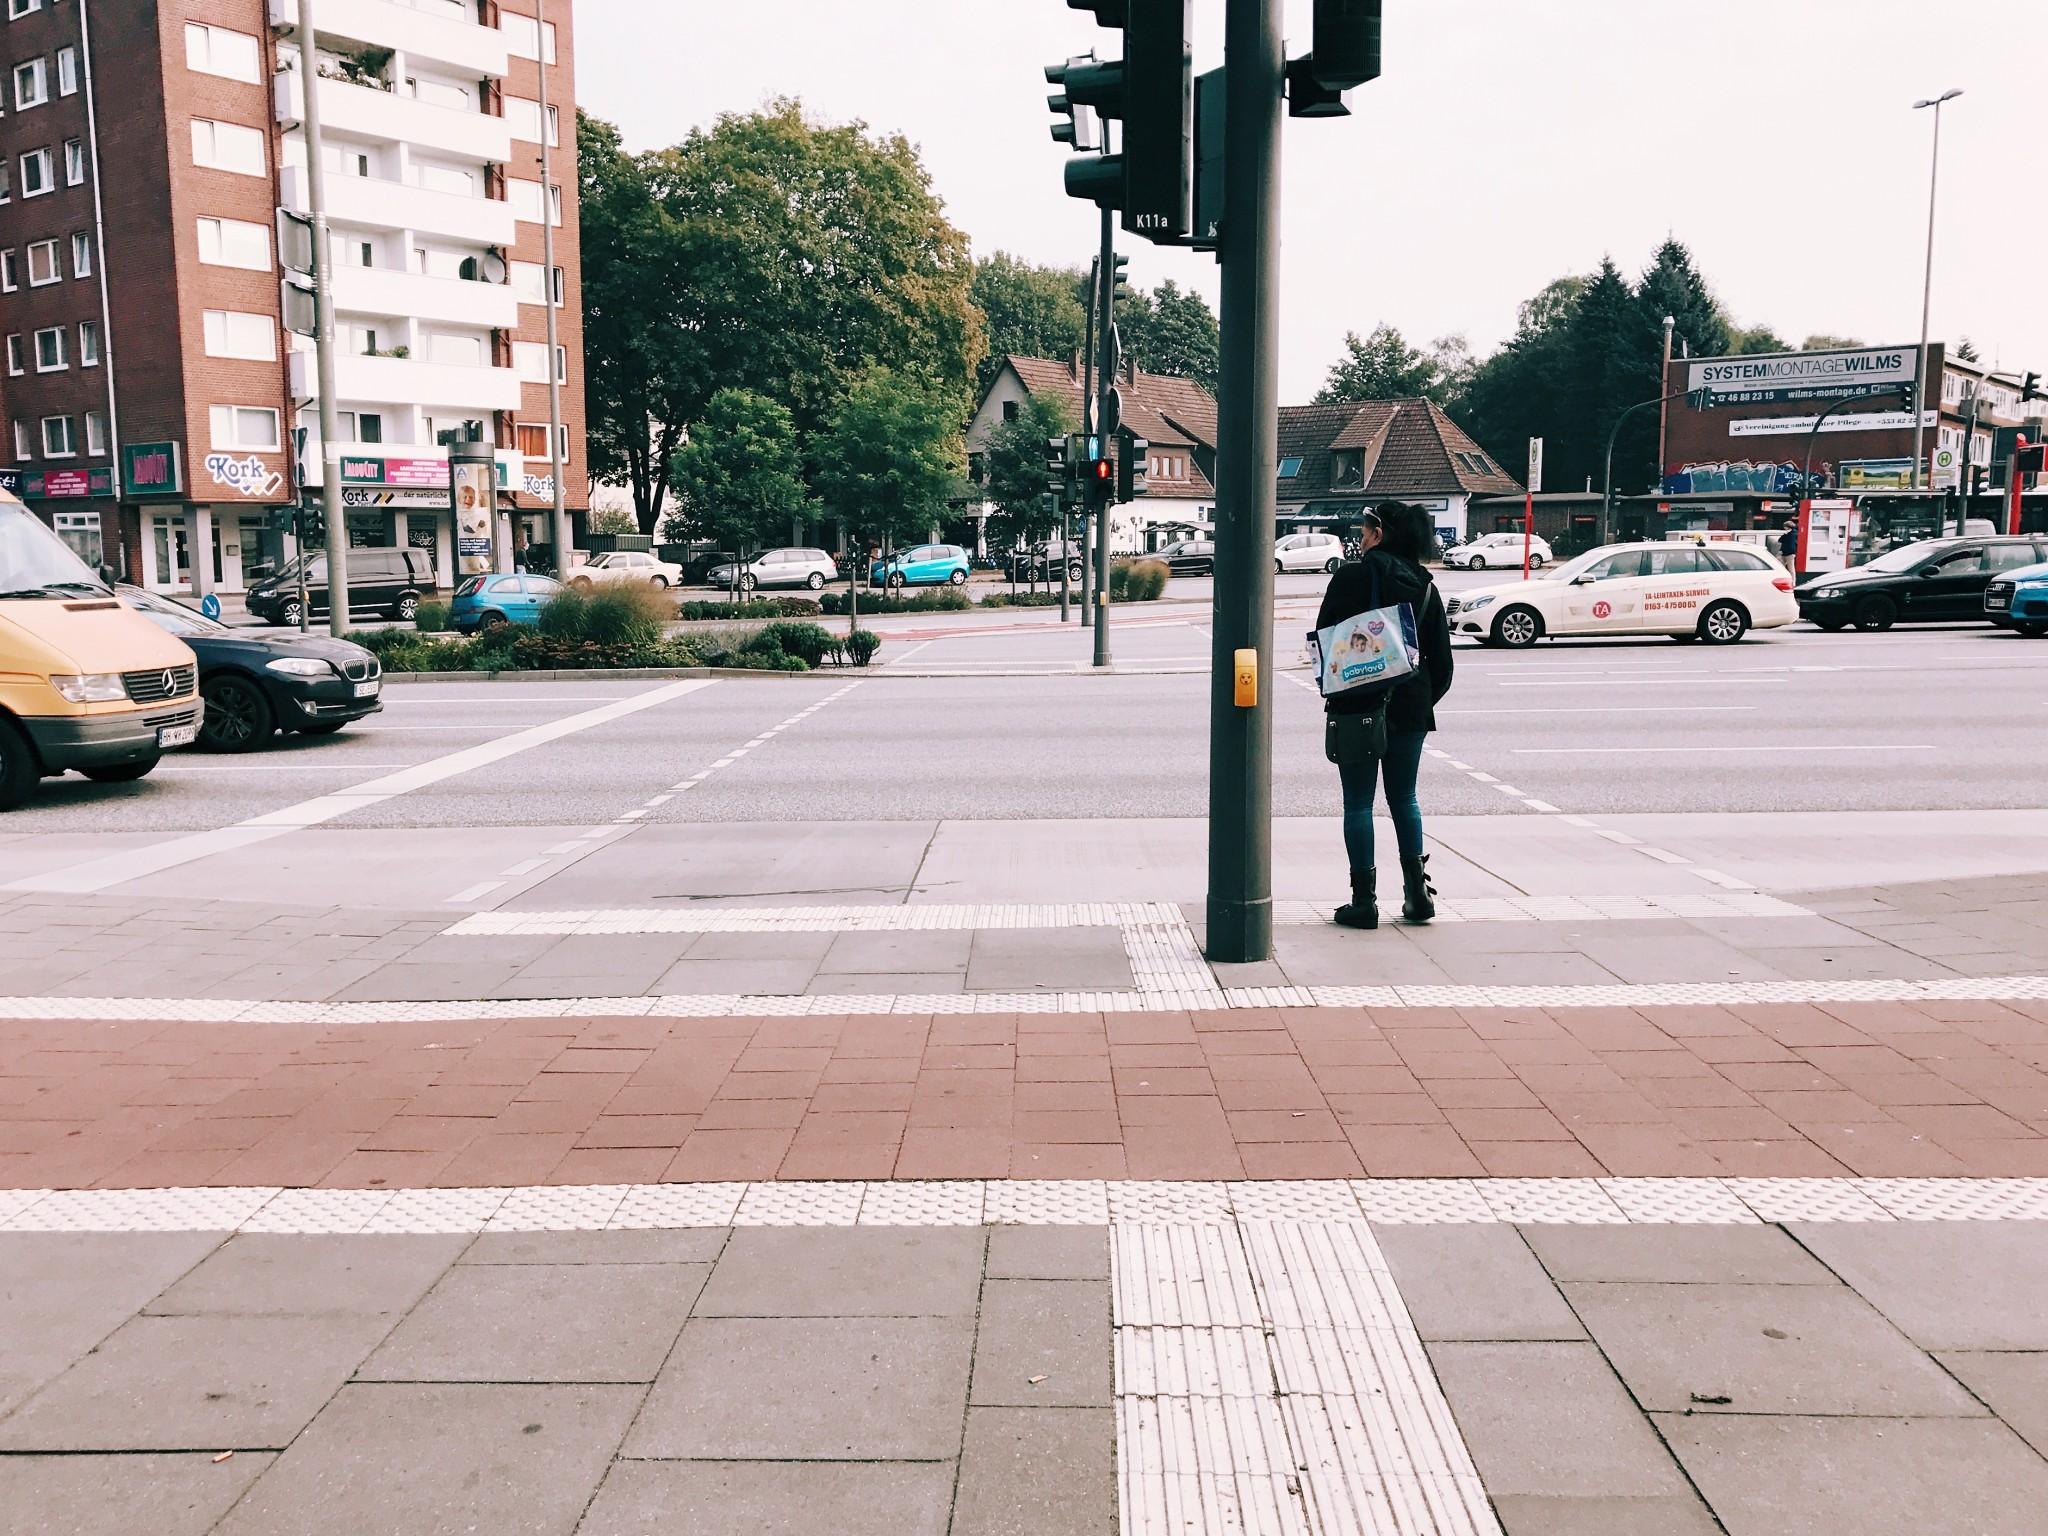 iphone7, streetphotography, hamburg